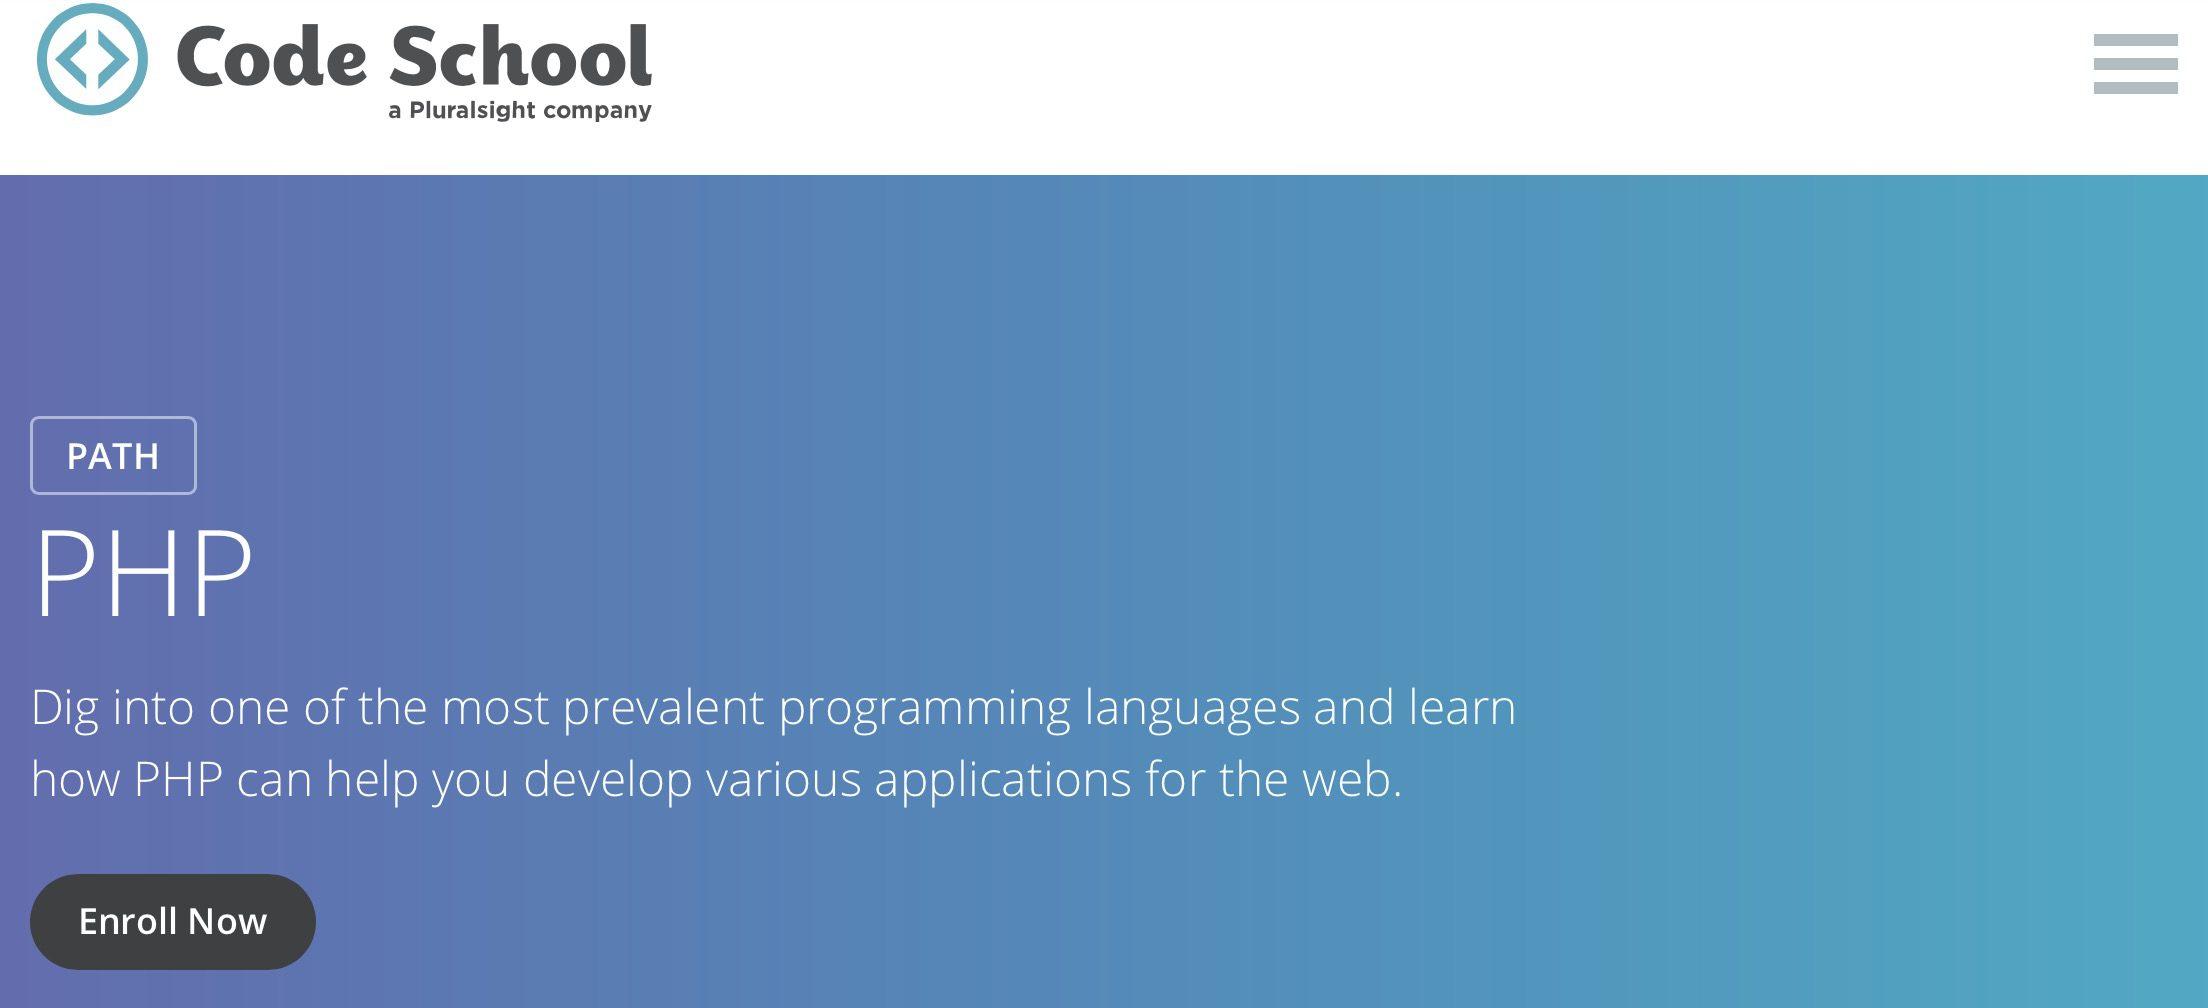 wordpress theme development tutorial for beginners pdf